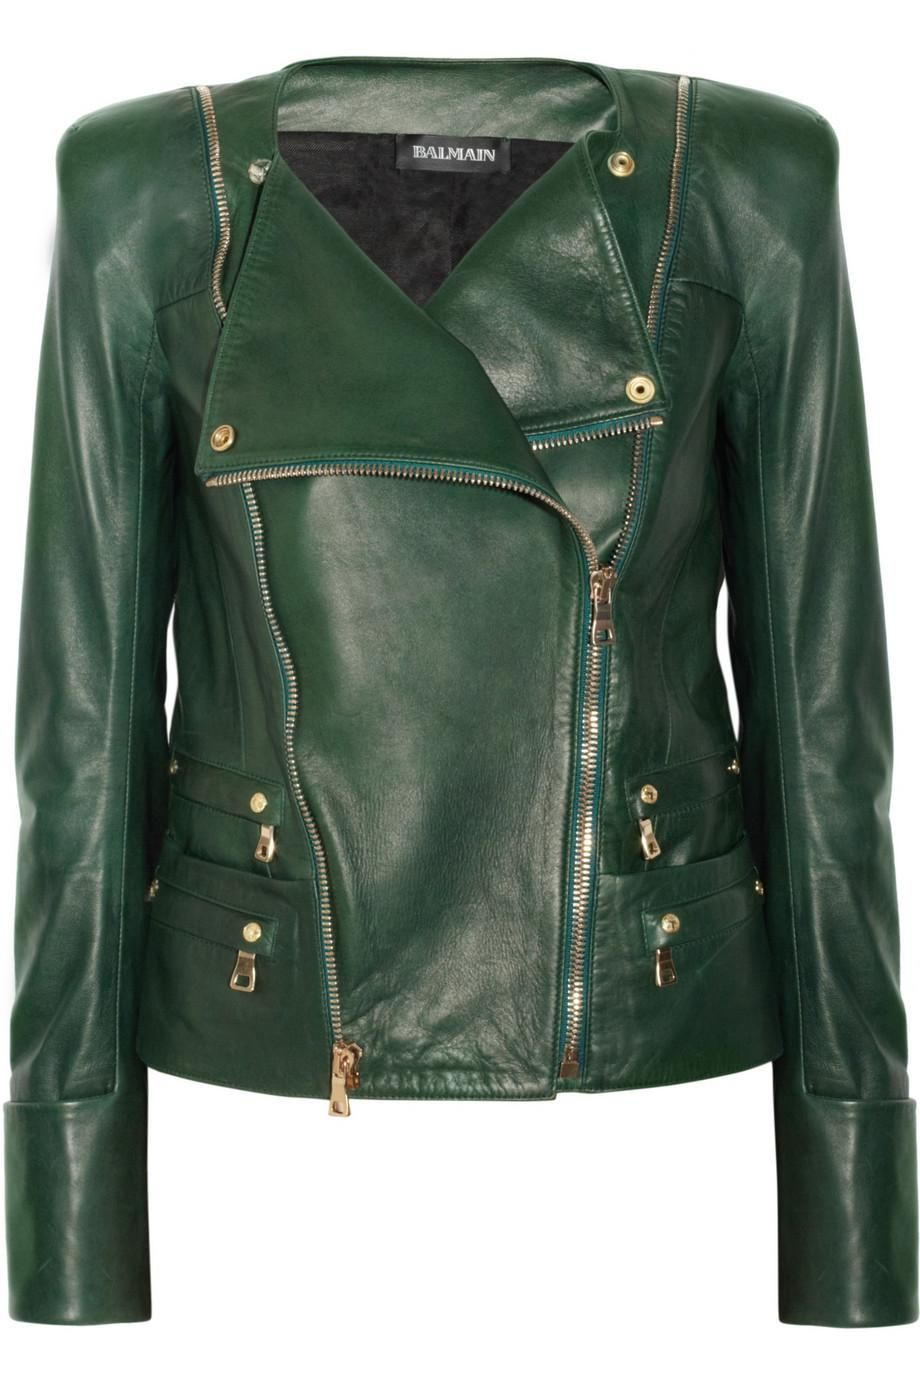 348278b3cee02 dark green leather by balmain